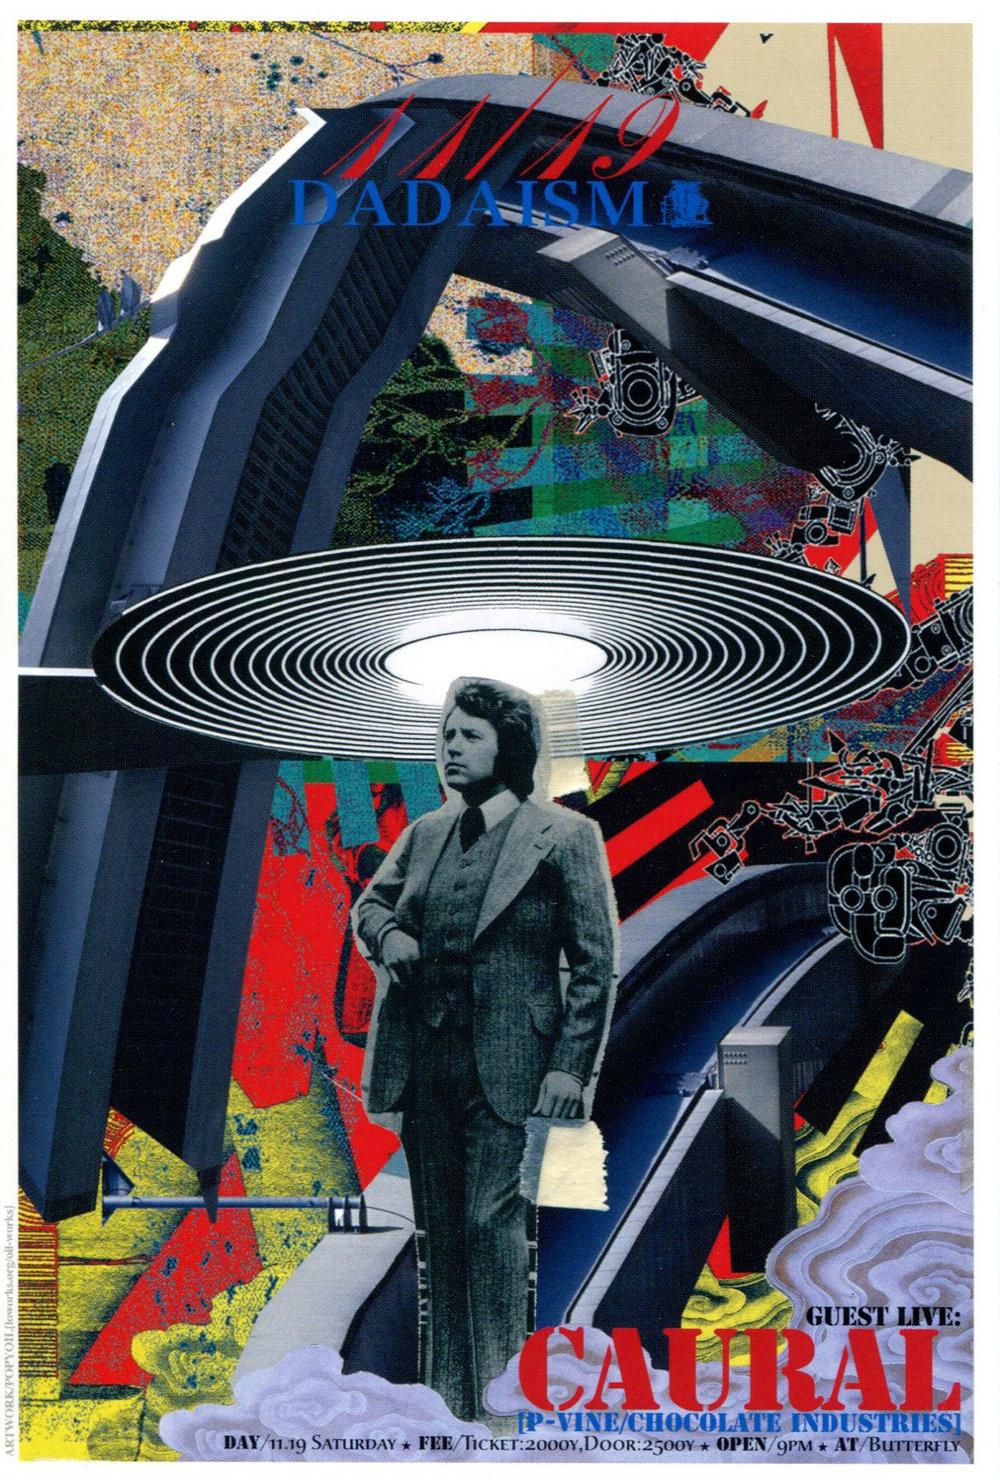 11-19-Dadaism_front.jpg